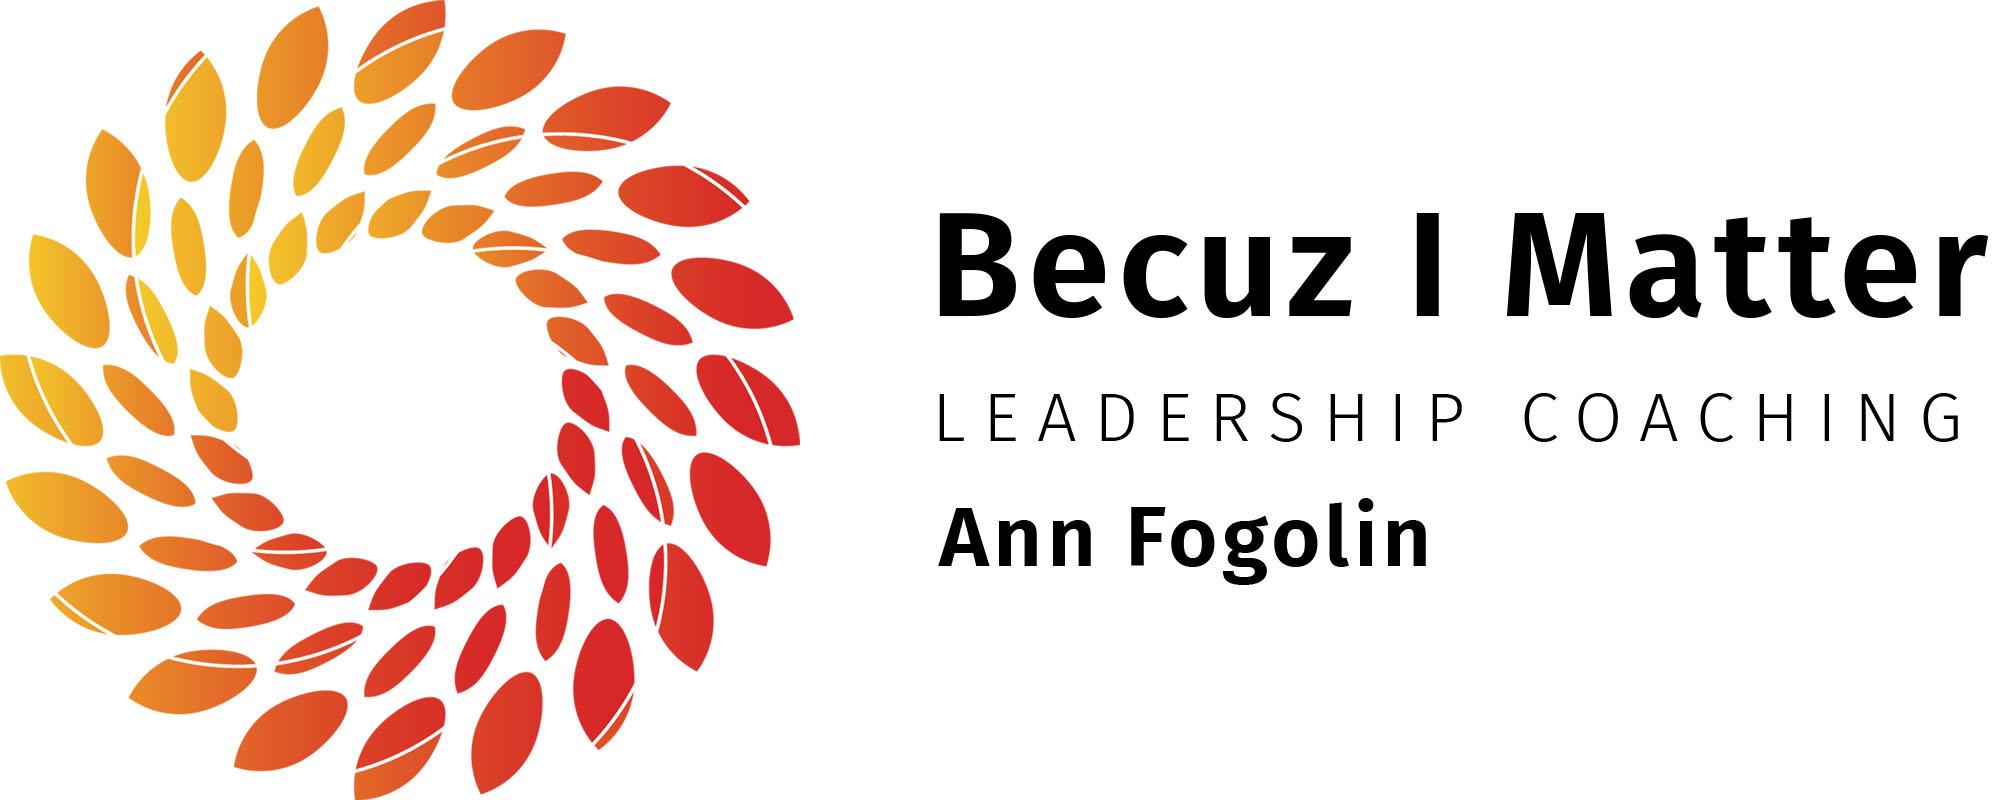 Becuz I Matter - Leadership Coaching - Ann Fogolin - Logo Lockup 2021